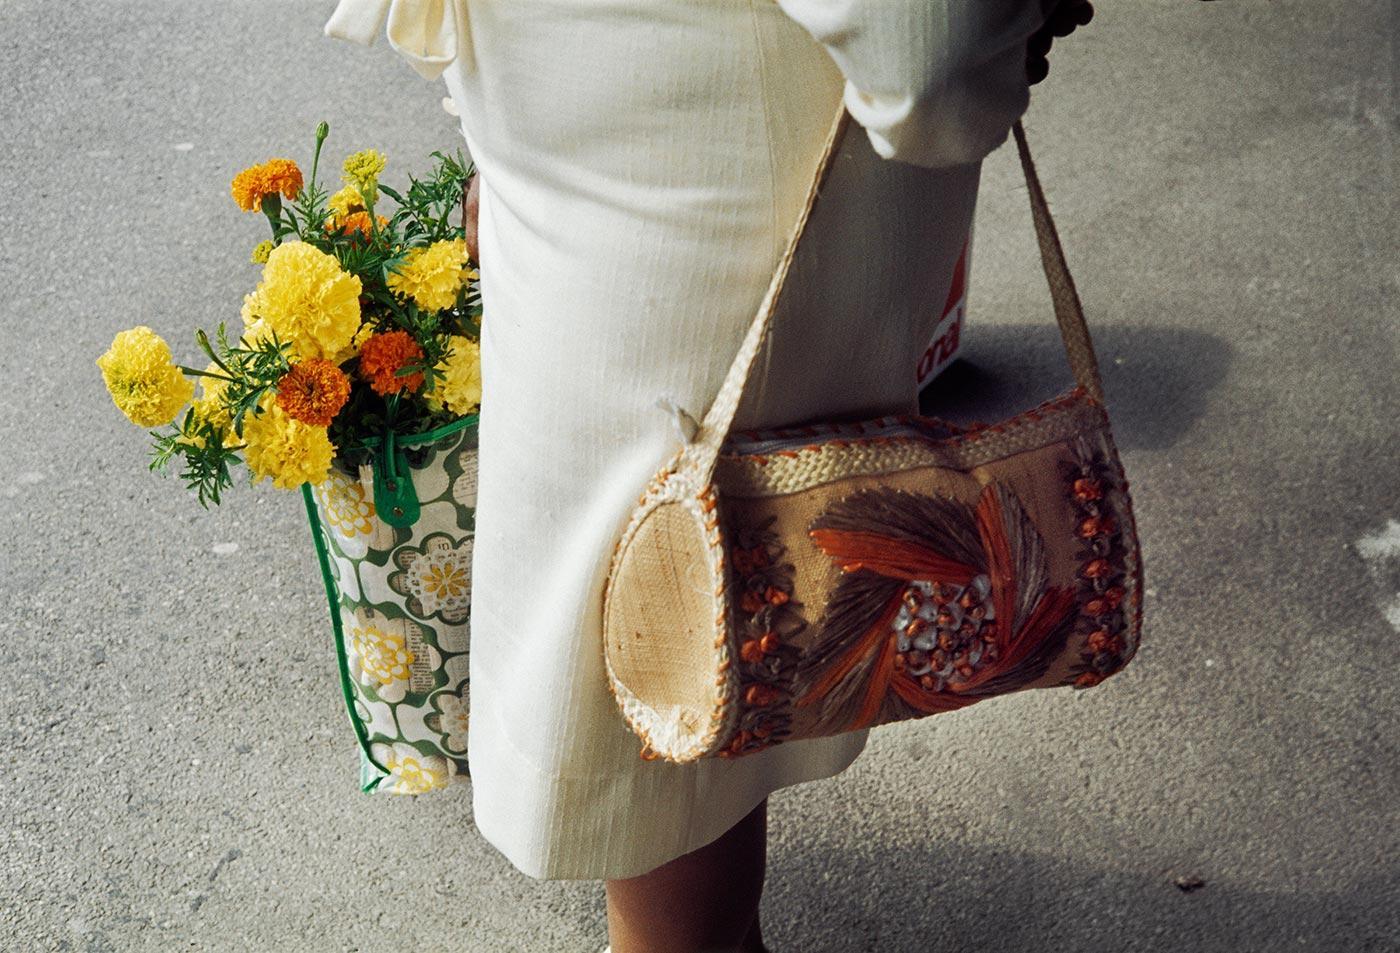 Fotó: Vivian Maier: 1975. augusztus © Maloof Collection